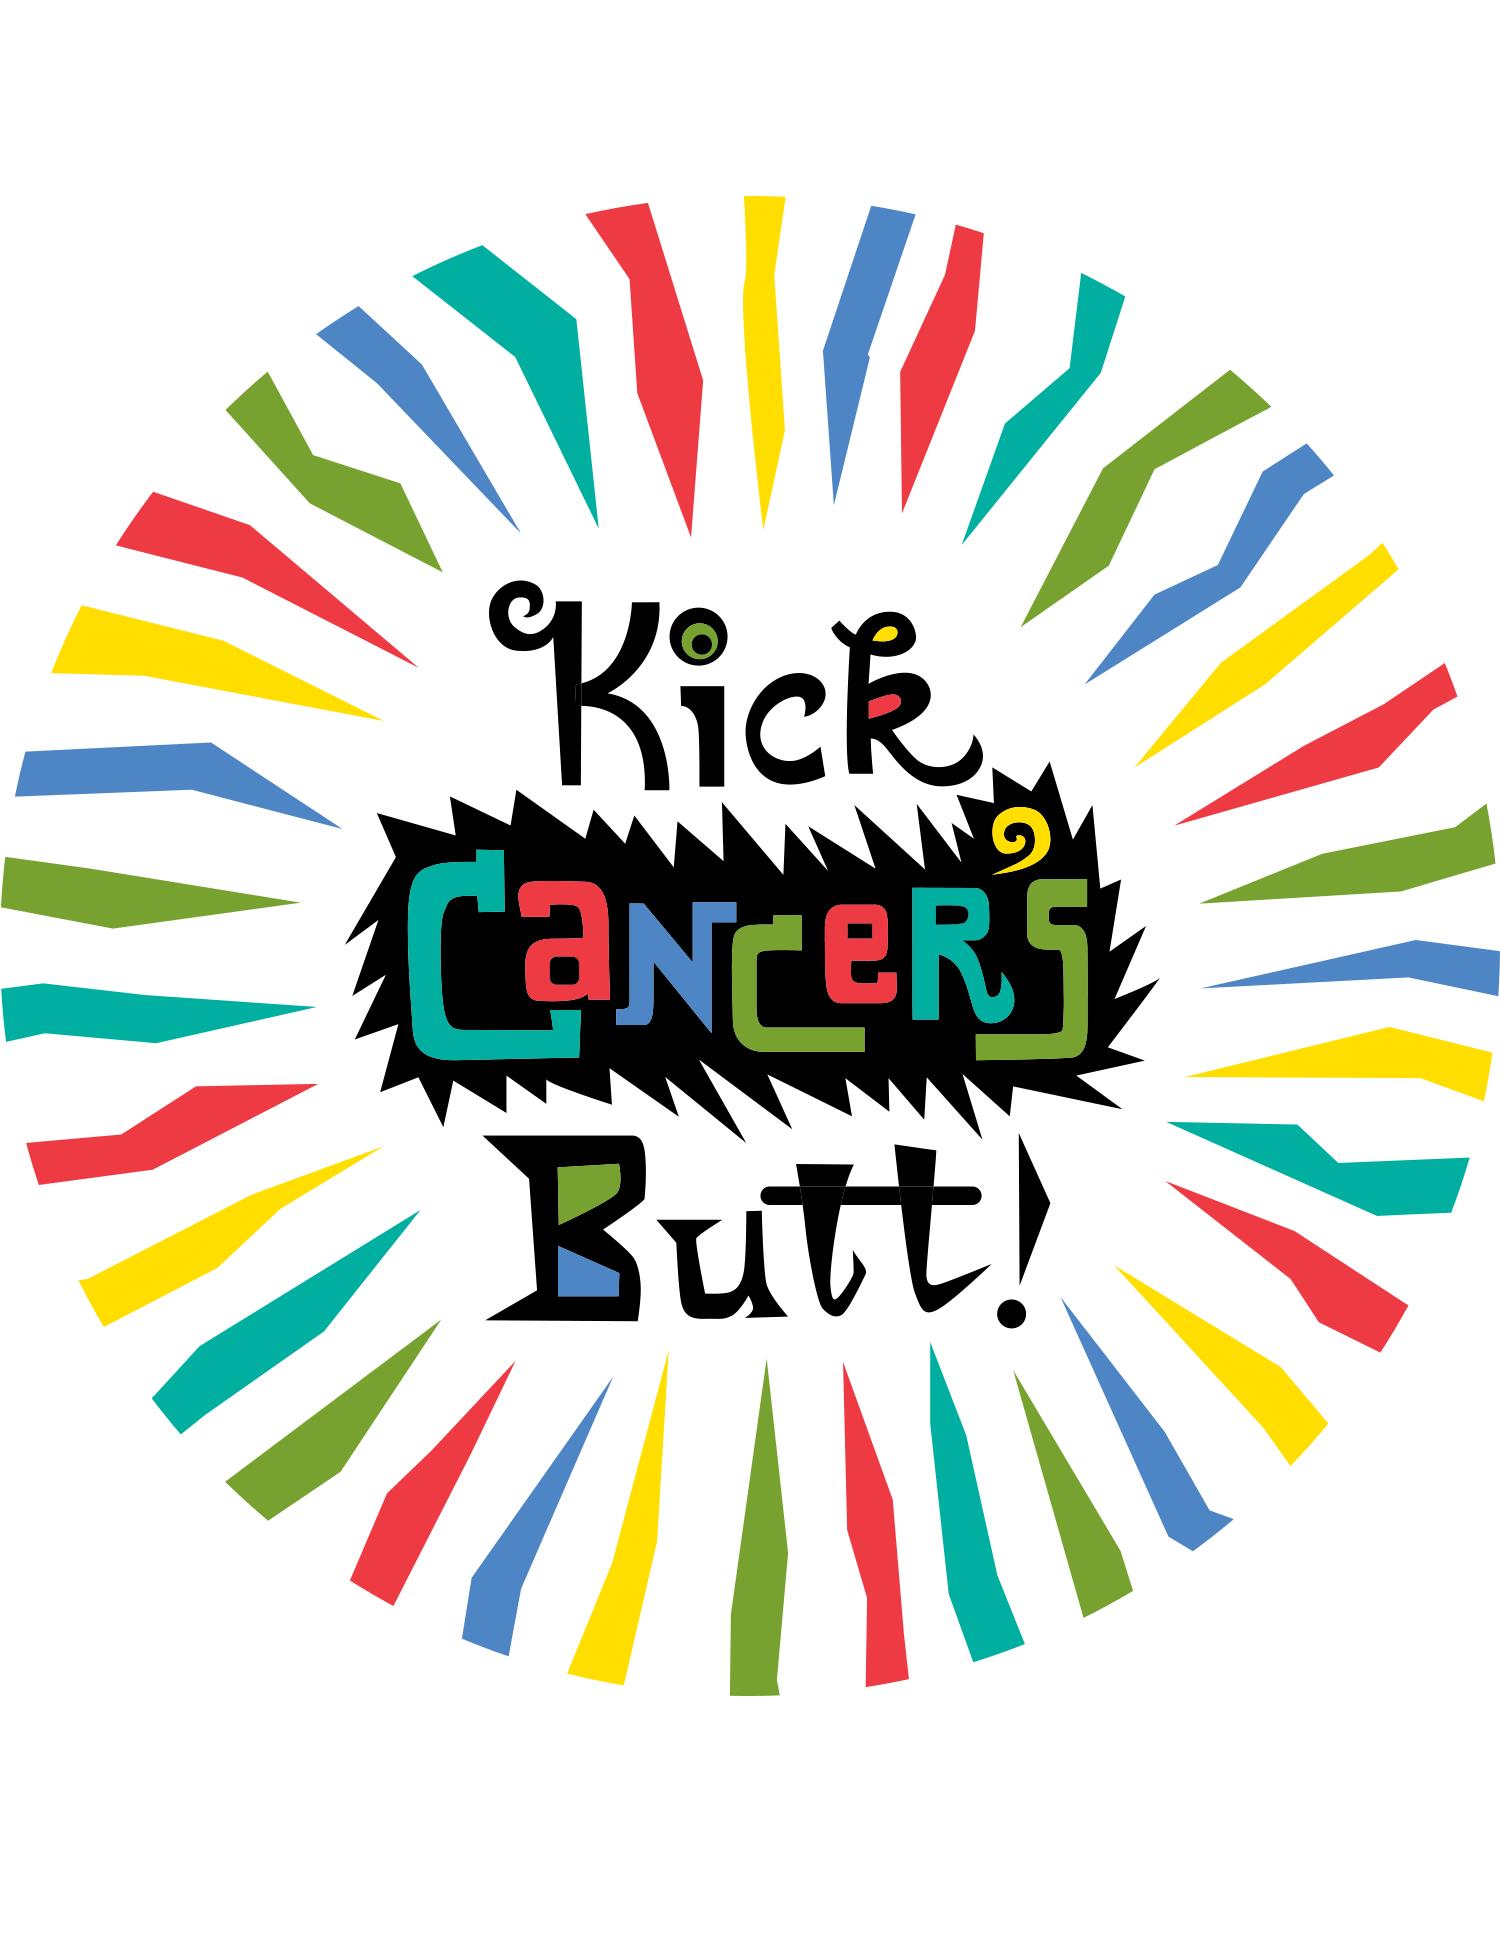 kick_cancers_butt_type_andi_bird.png